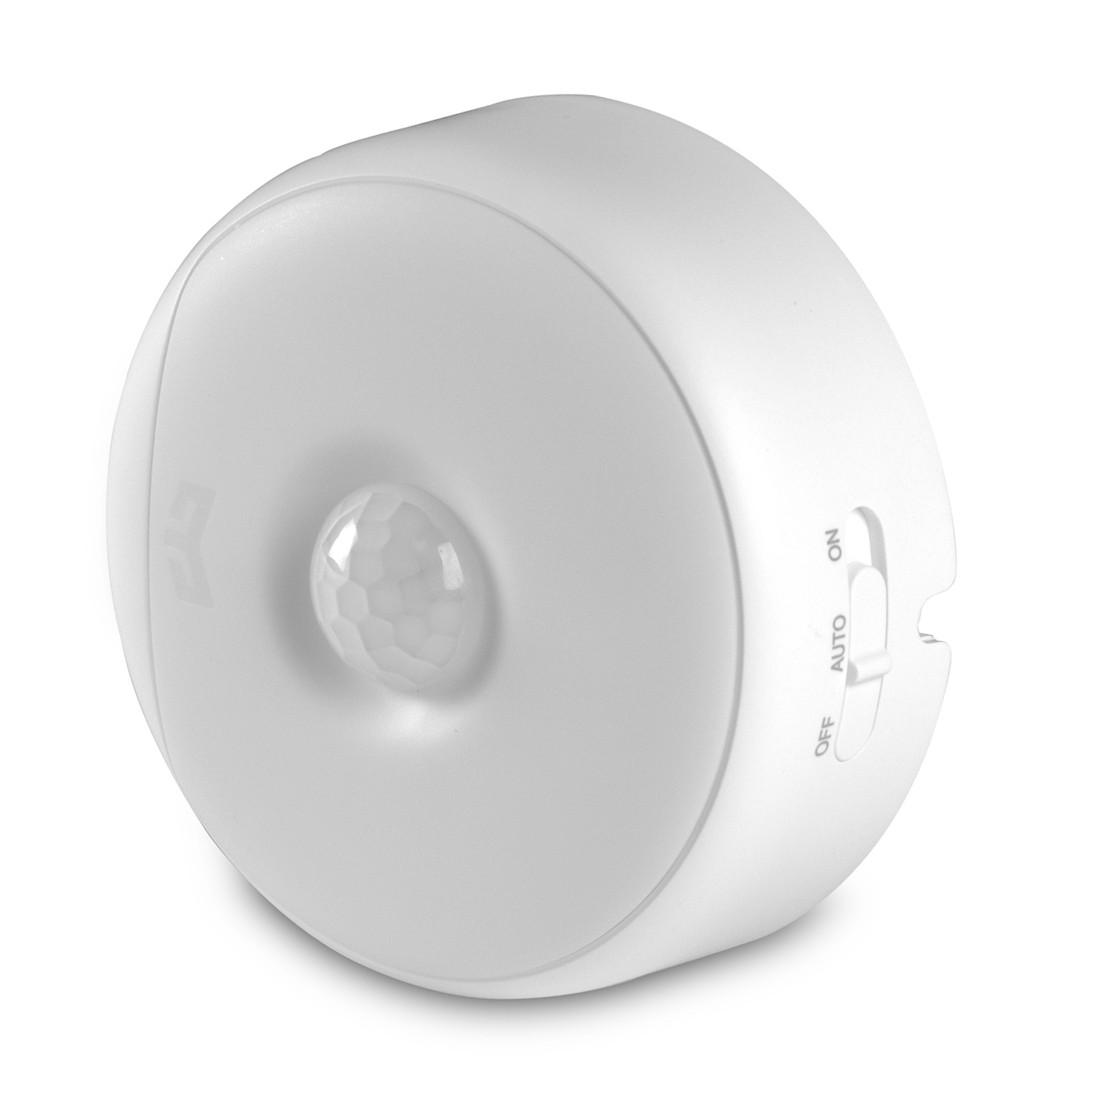 Светильник, Xiaomi, YD0010W0CN Yelight, Цветовая температура: 2700K, Яркость Макс. 7lm, Мин. 3.5lm,